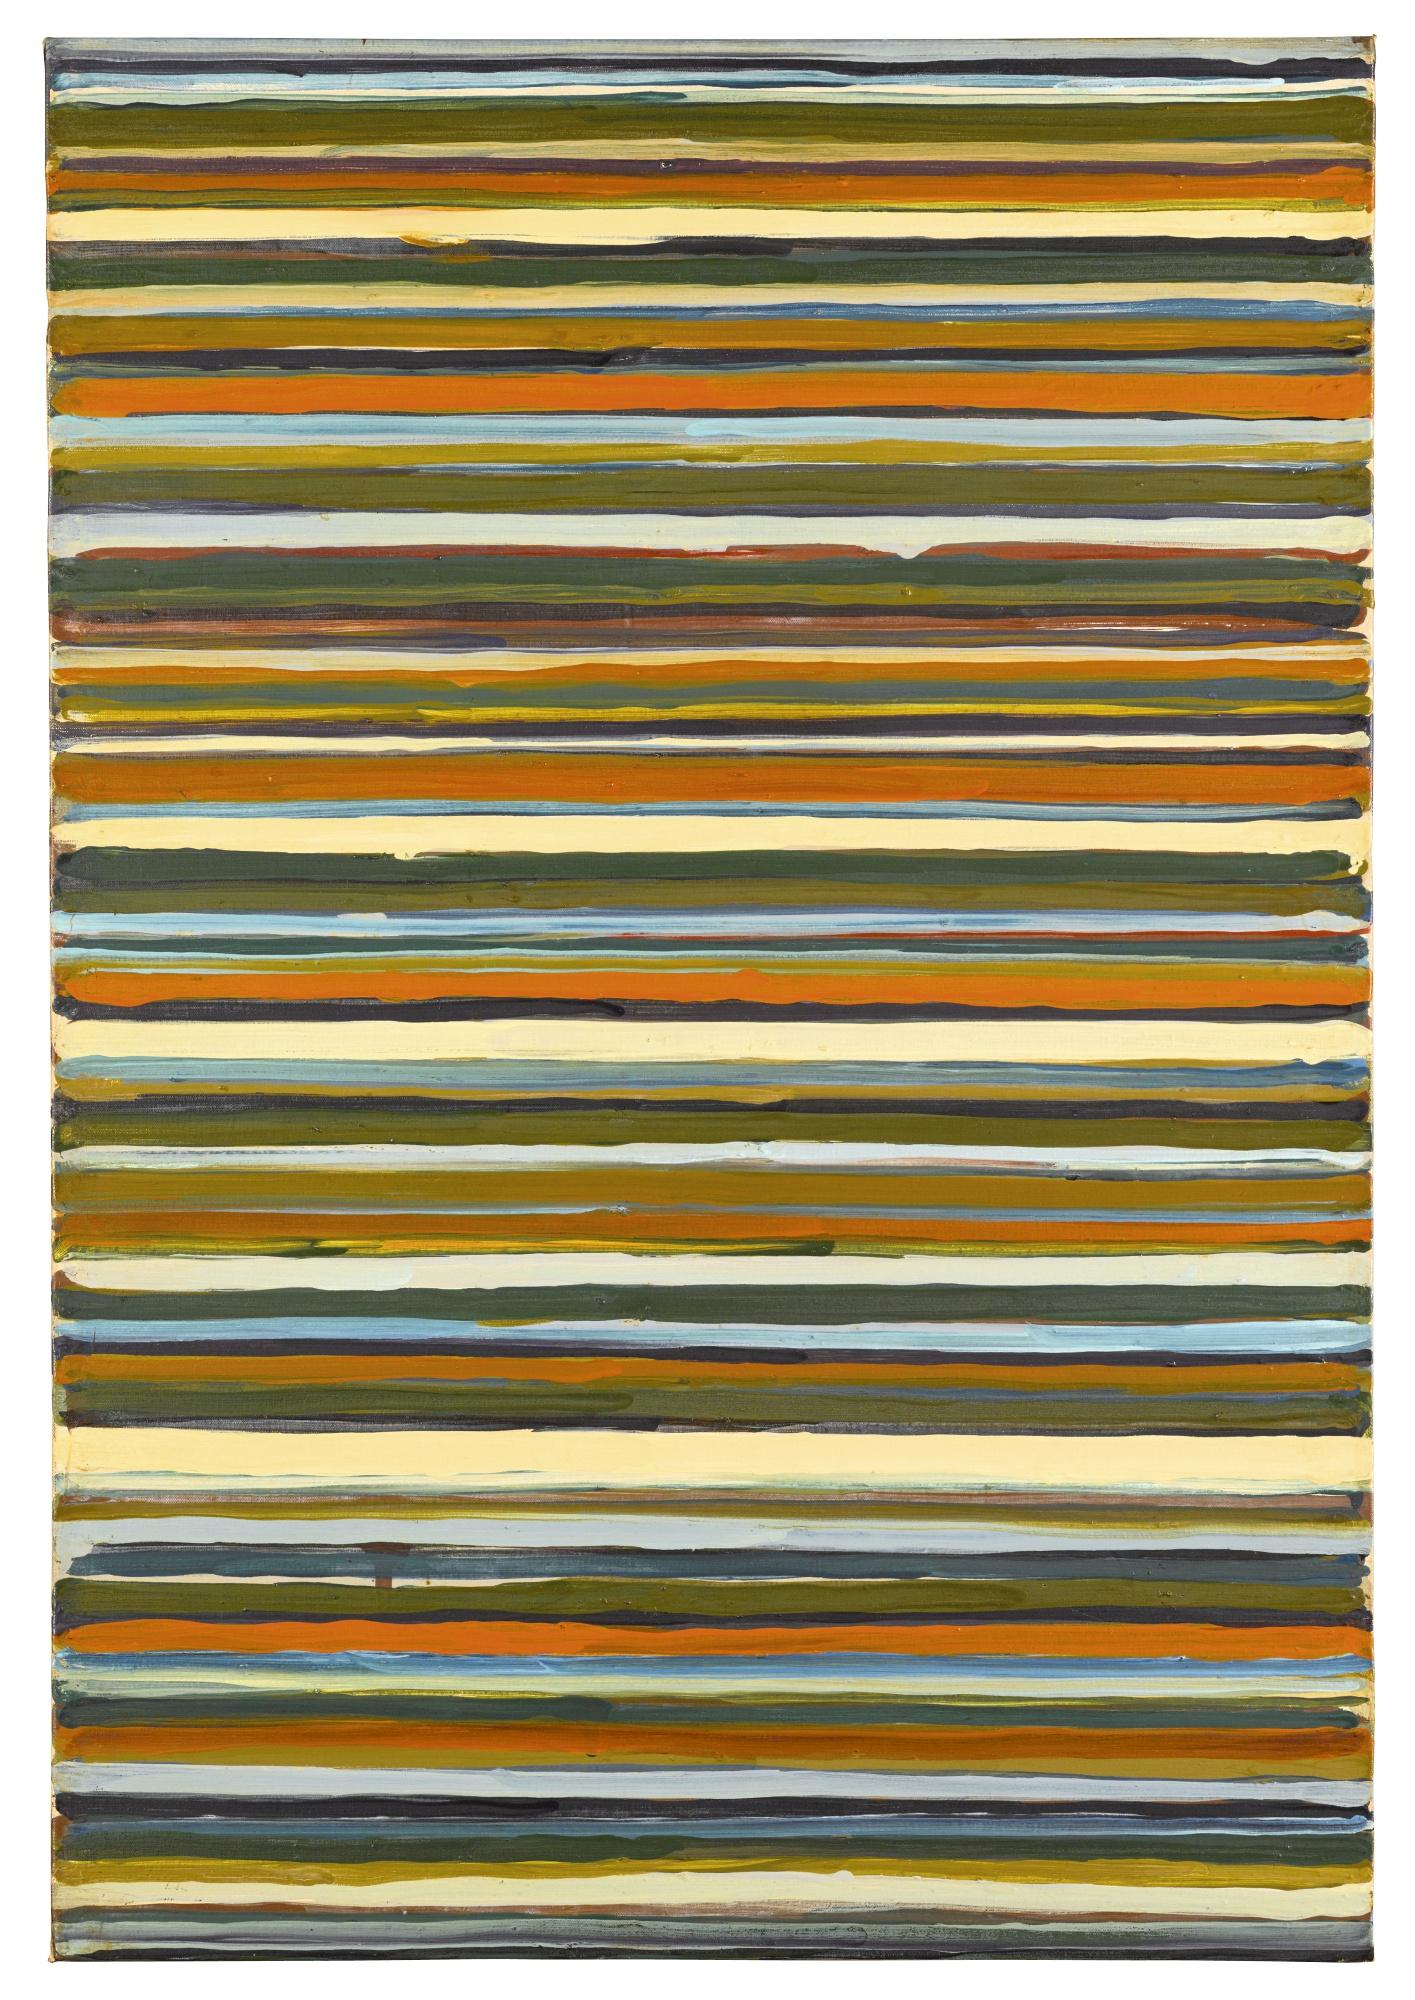 Masaaki Yamada-Work C.80-1961